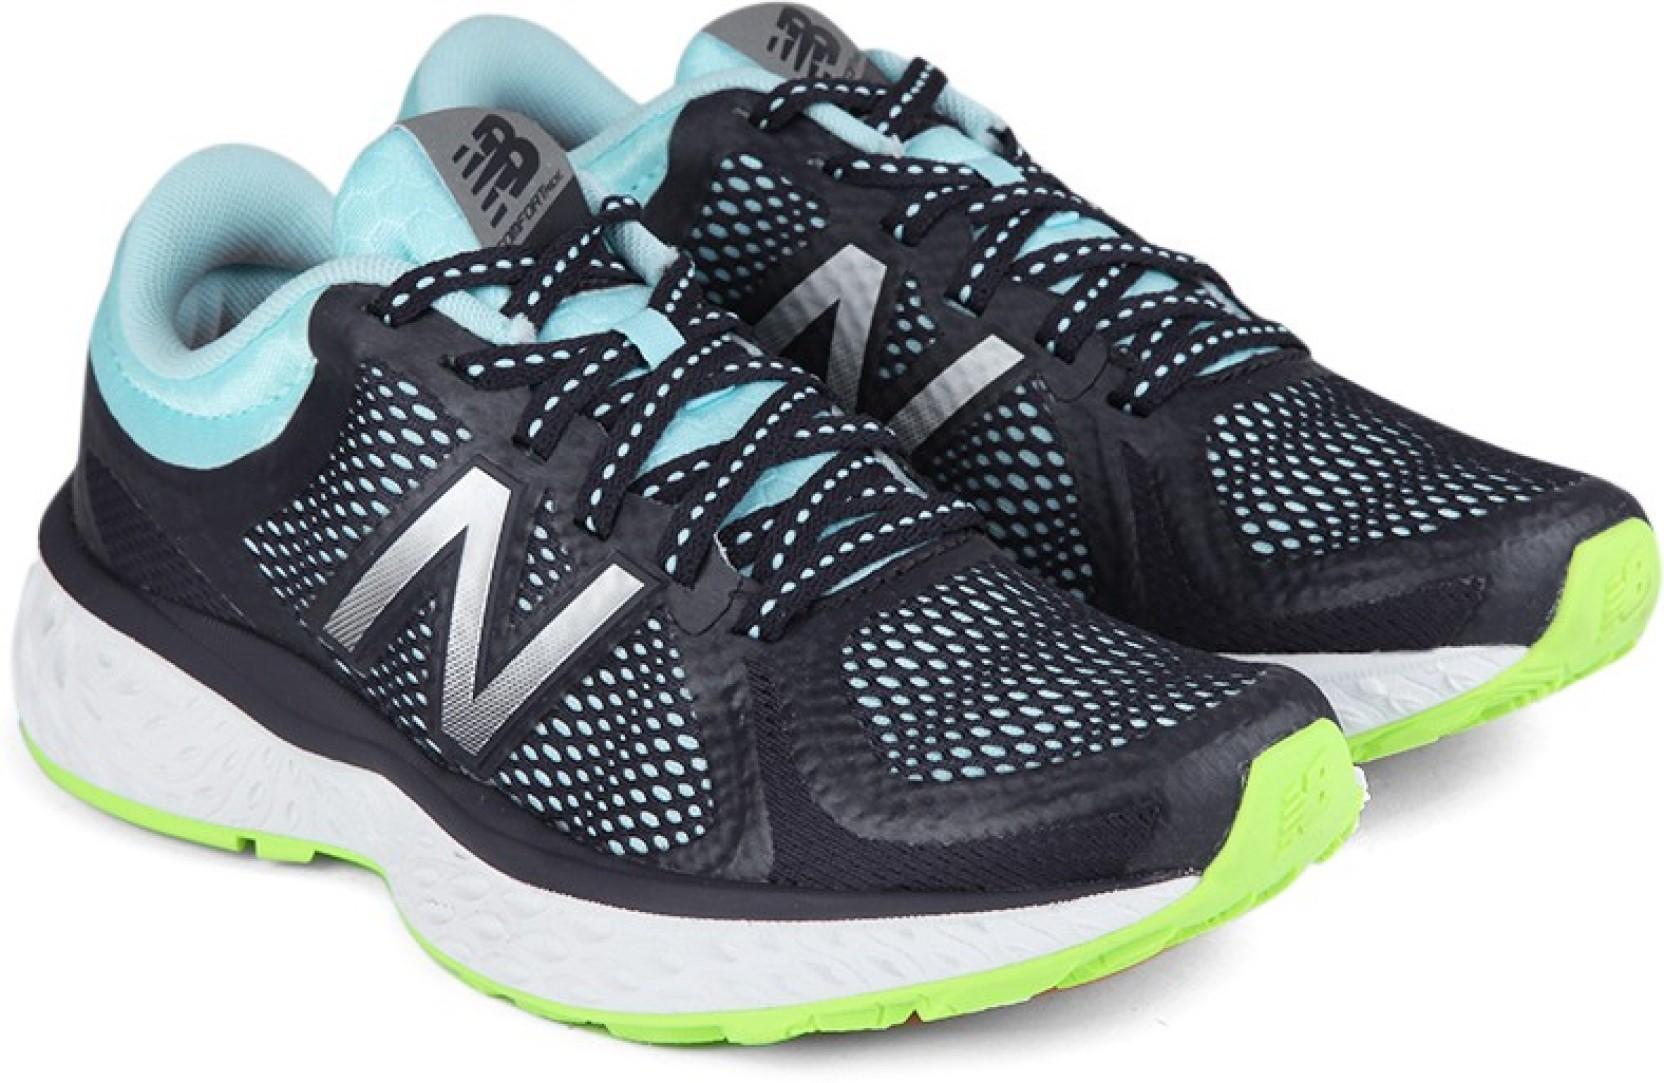 wholesale dealer 7c817 39340 New Balance 720 Running Shoes For Women